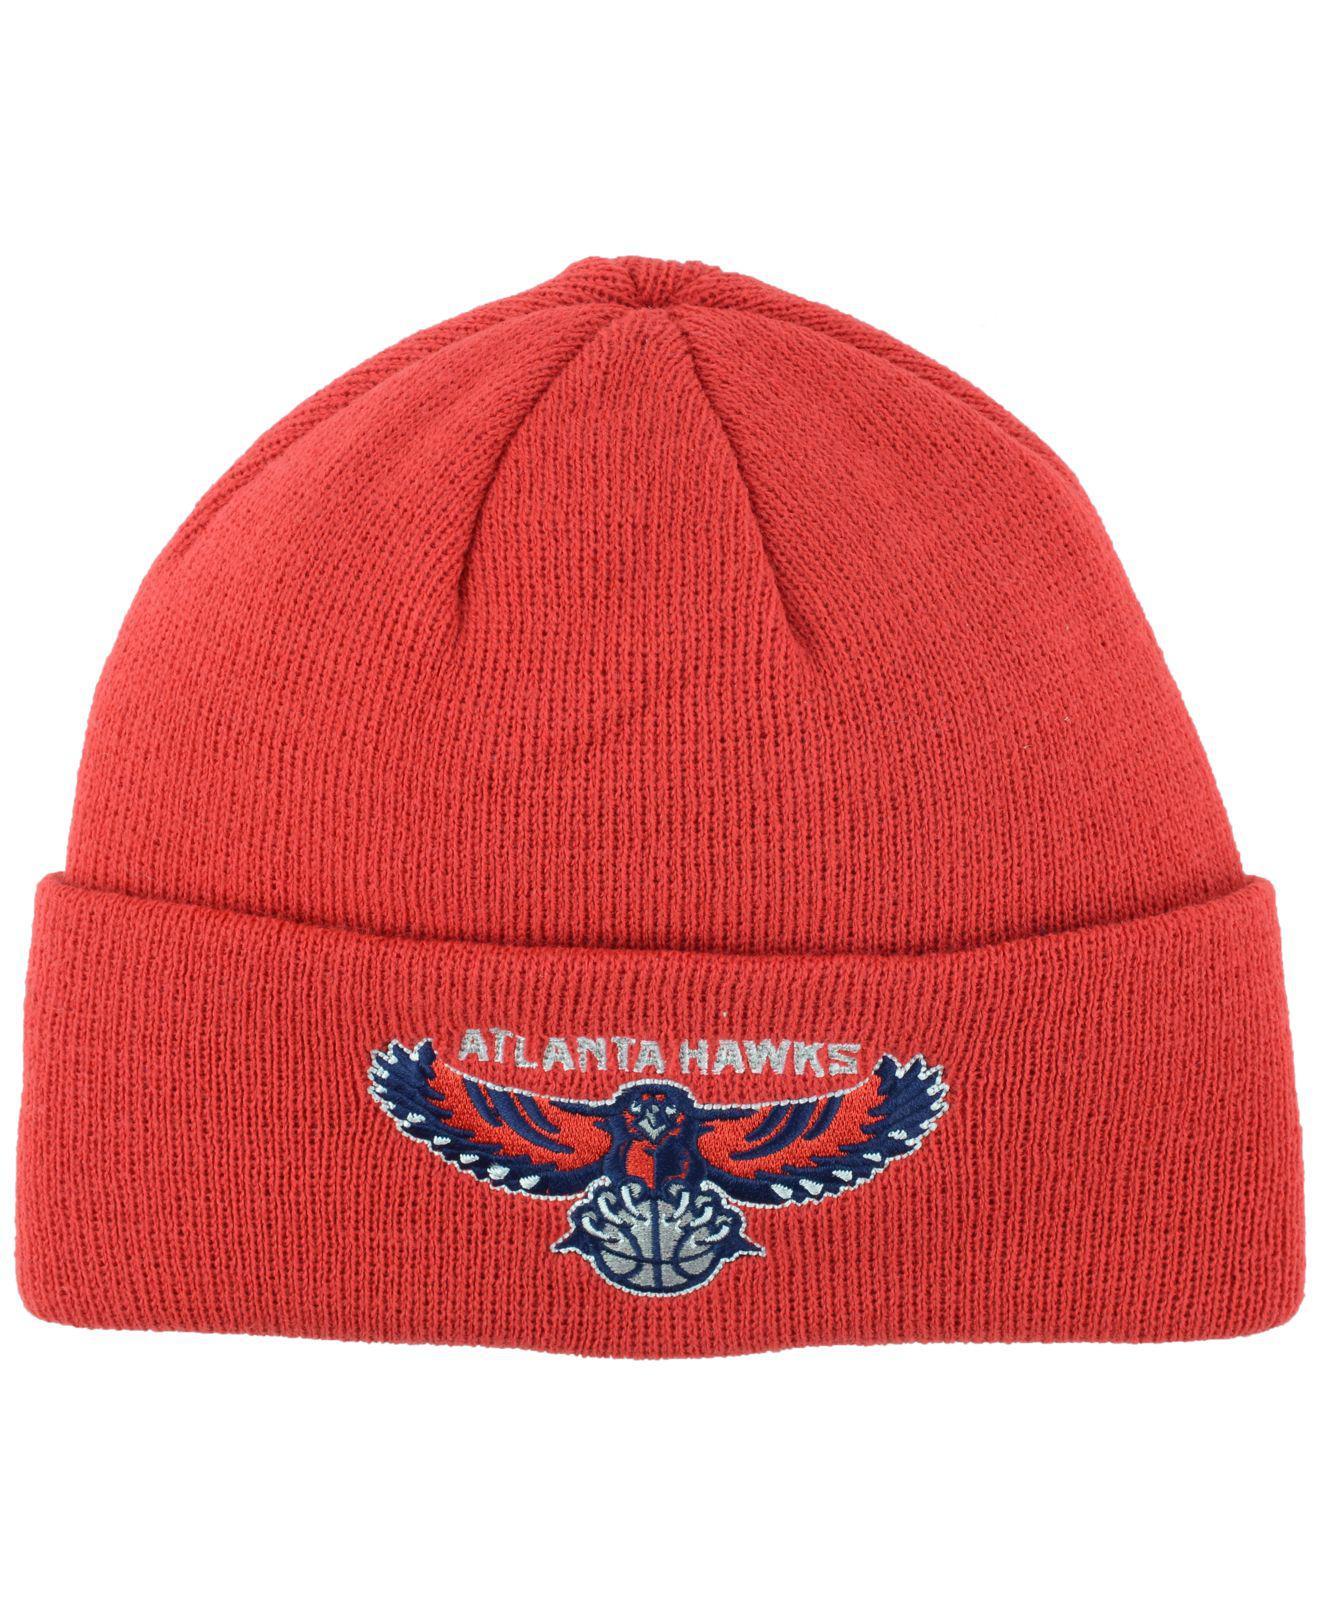 be5b284e914 Lyst - adidas Atlanta Hawks Cuff Knit Hat in Red for Men